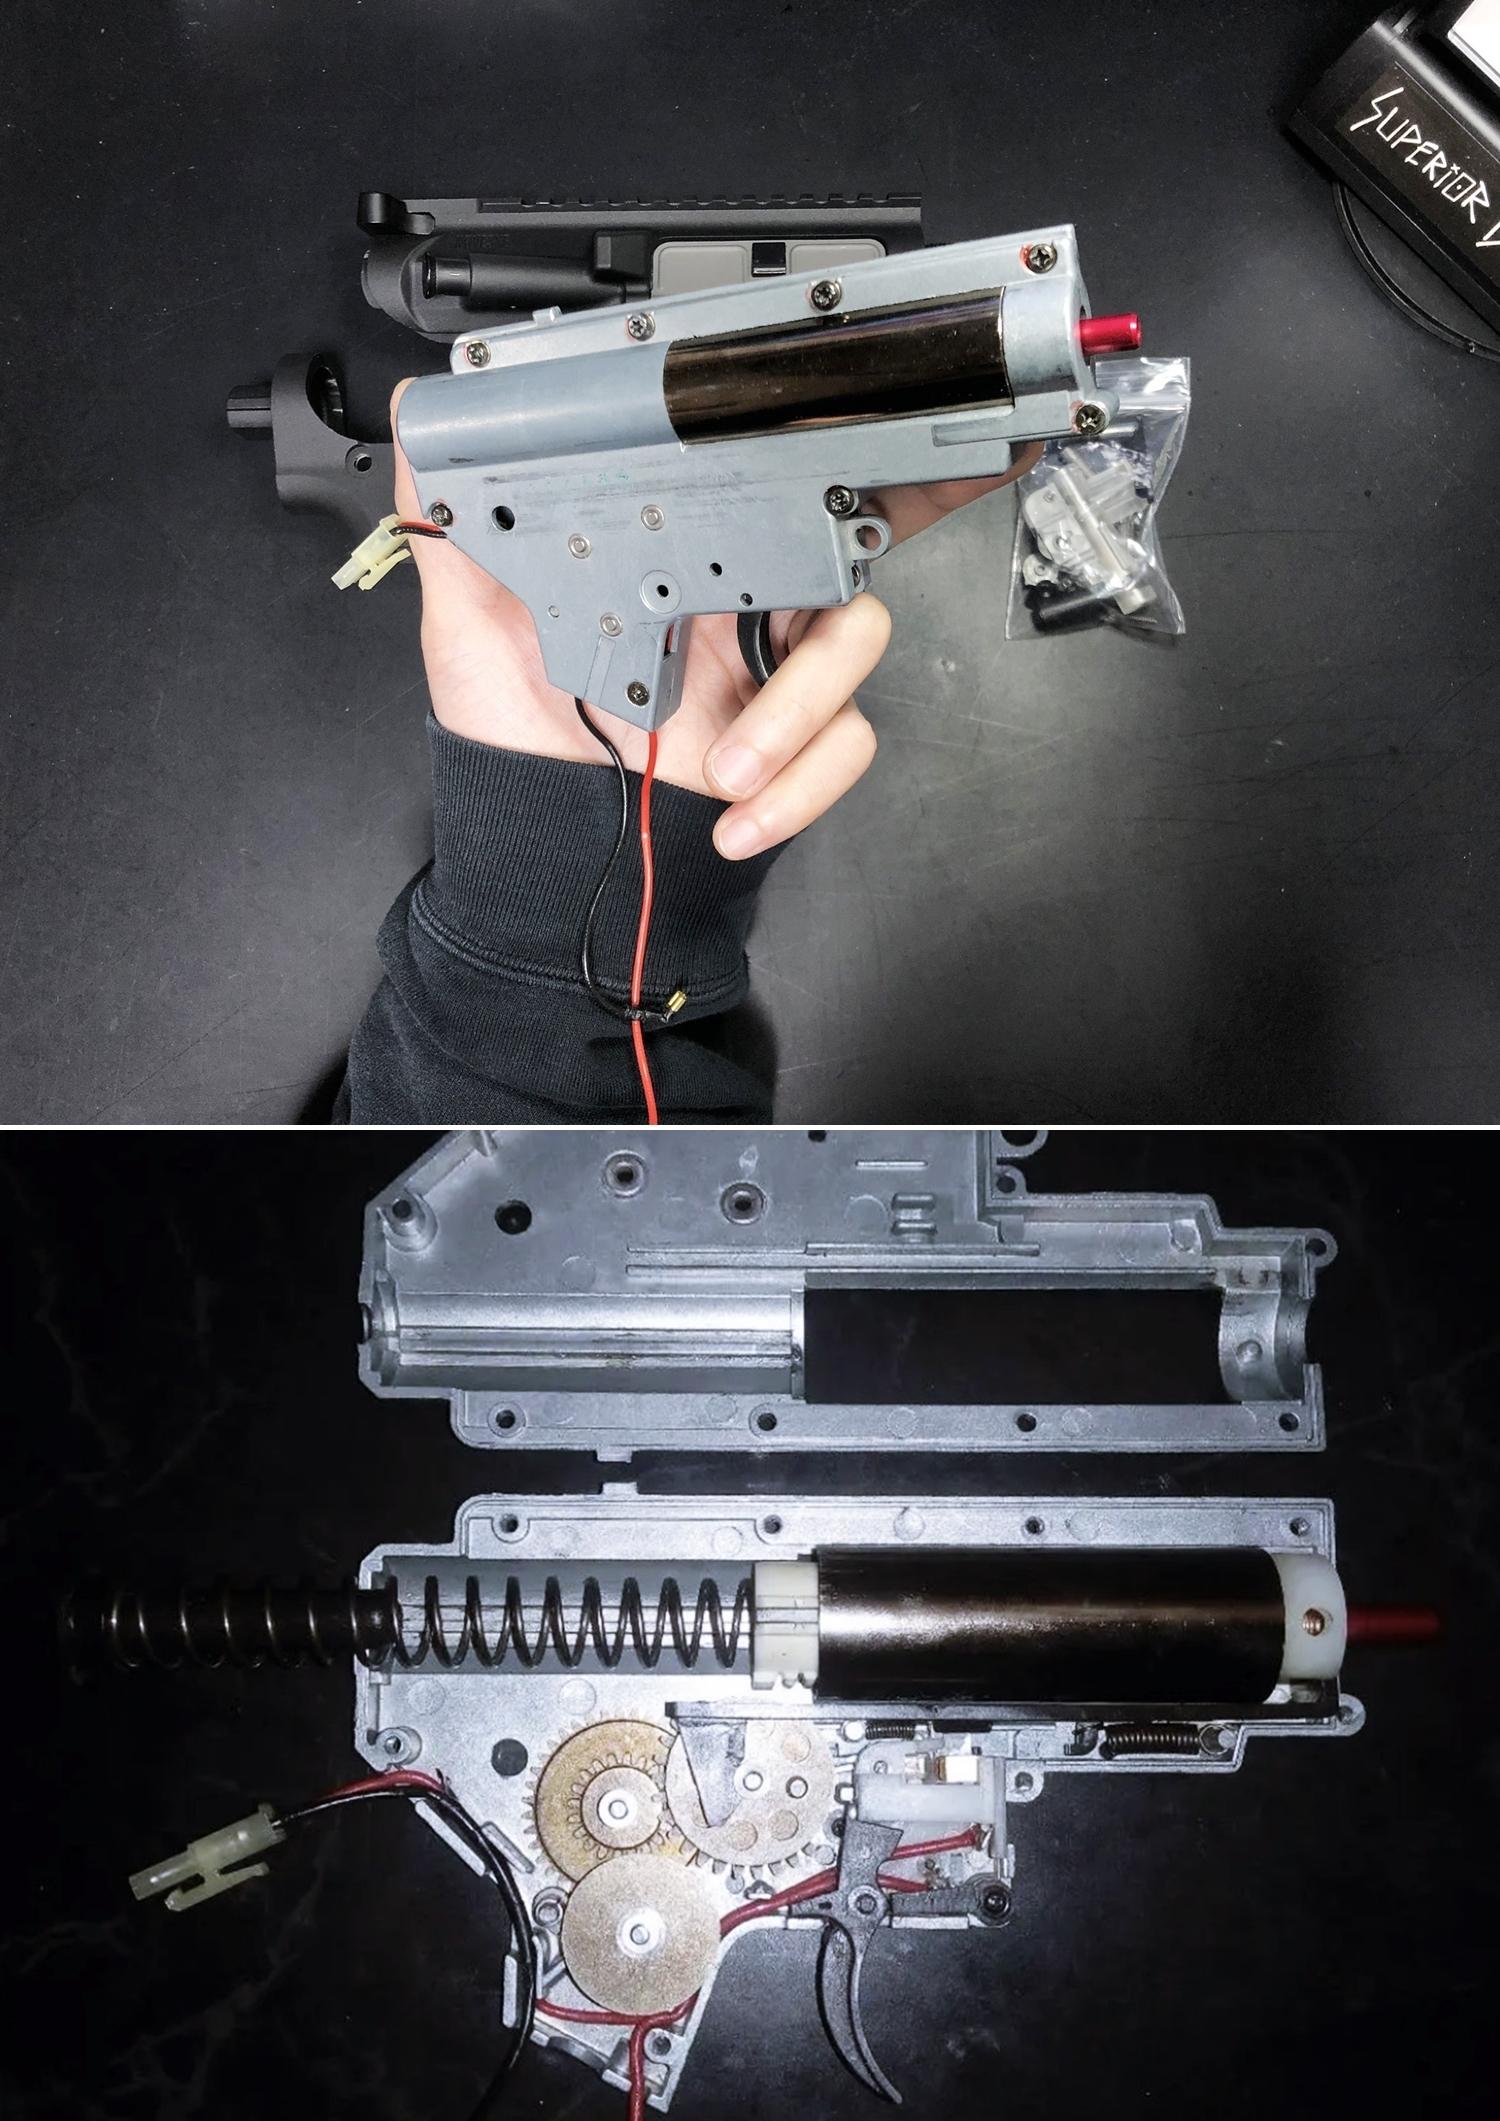 5 NOVESKE GEN3 N4 BY MADBULL!! 『第一弾』 新たにSTD民間系ARを作り始めたいと思います!! STD AR-15 M4 スタンダード 電動ガン マルイ ノベスケ ノベスキー マットブル メタルフレーム 動作テスト 組込 取付 カス